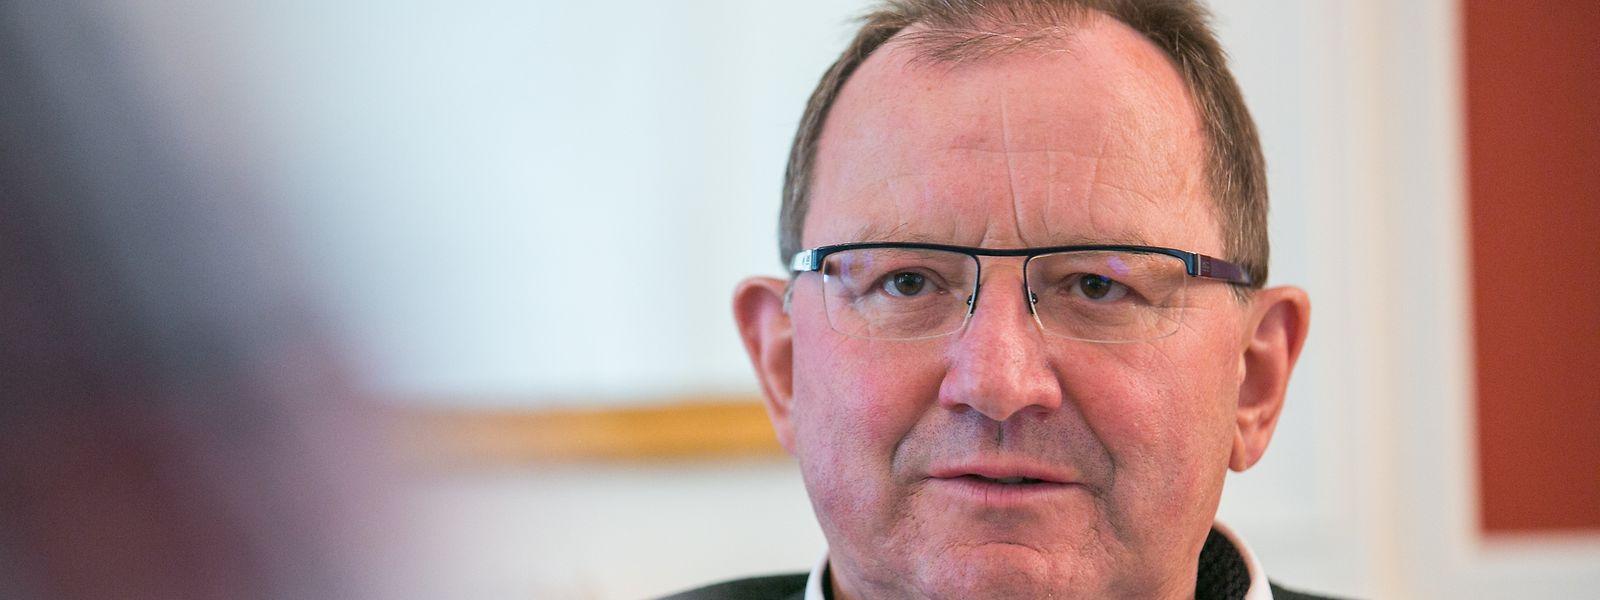 Konsumentenschutzminister Fernand Etgen will die Kontrollen optimieren.